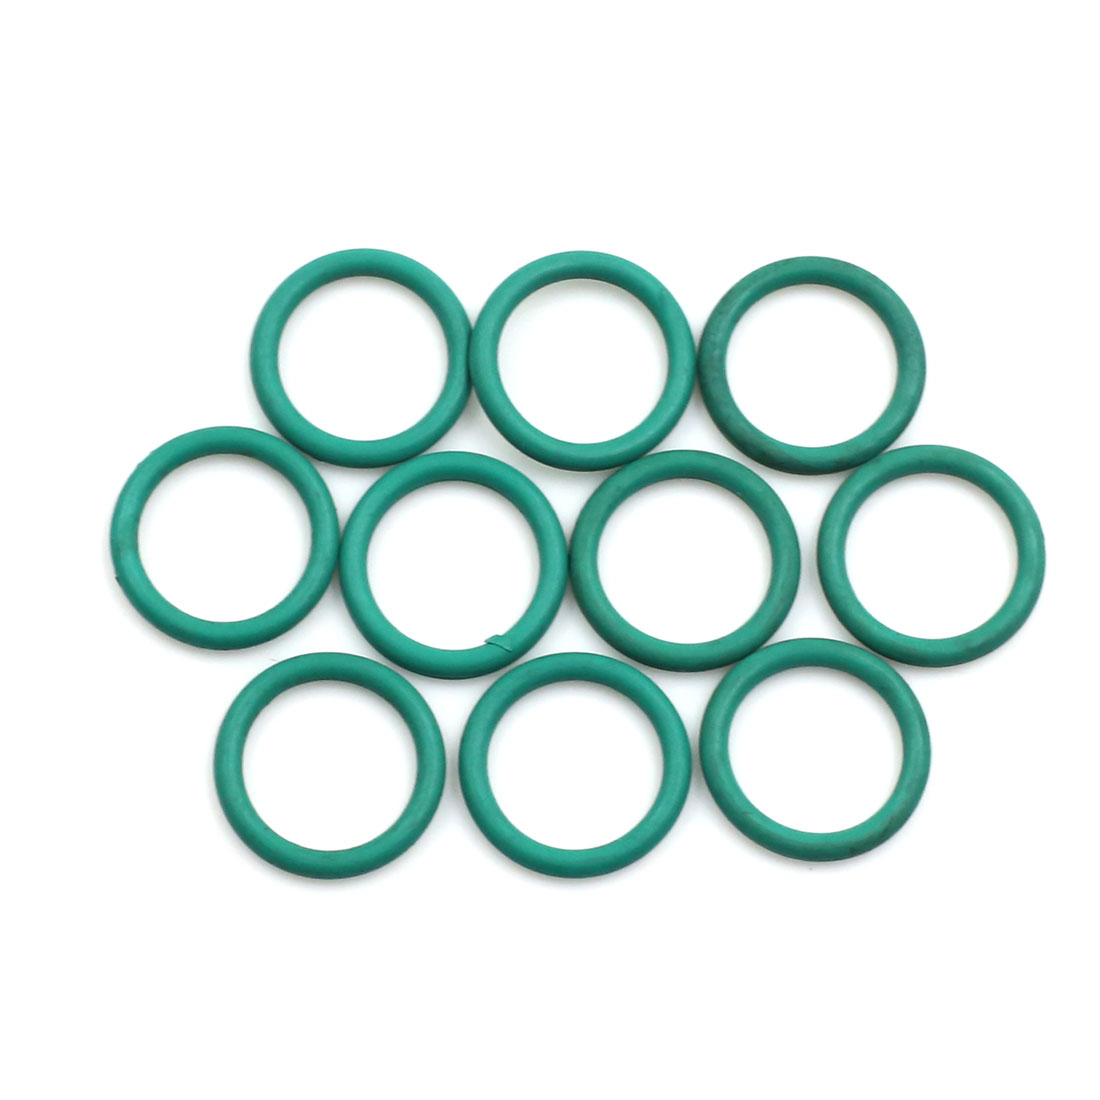 10pcs Green Universal FKM O-Ring Sealing Gasket Washer for Car 16mm x 2mm